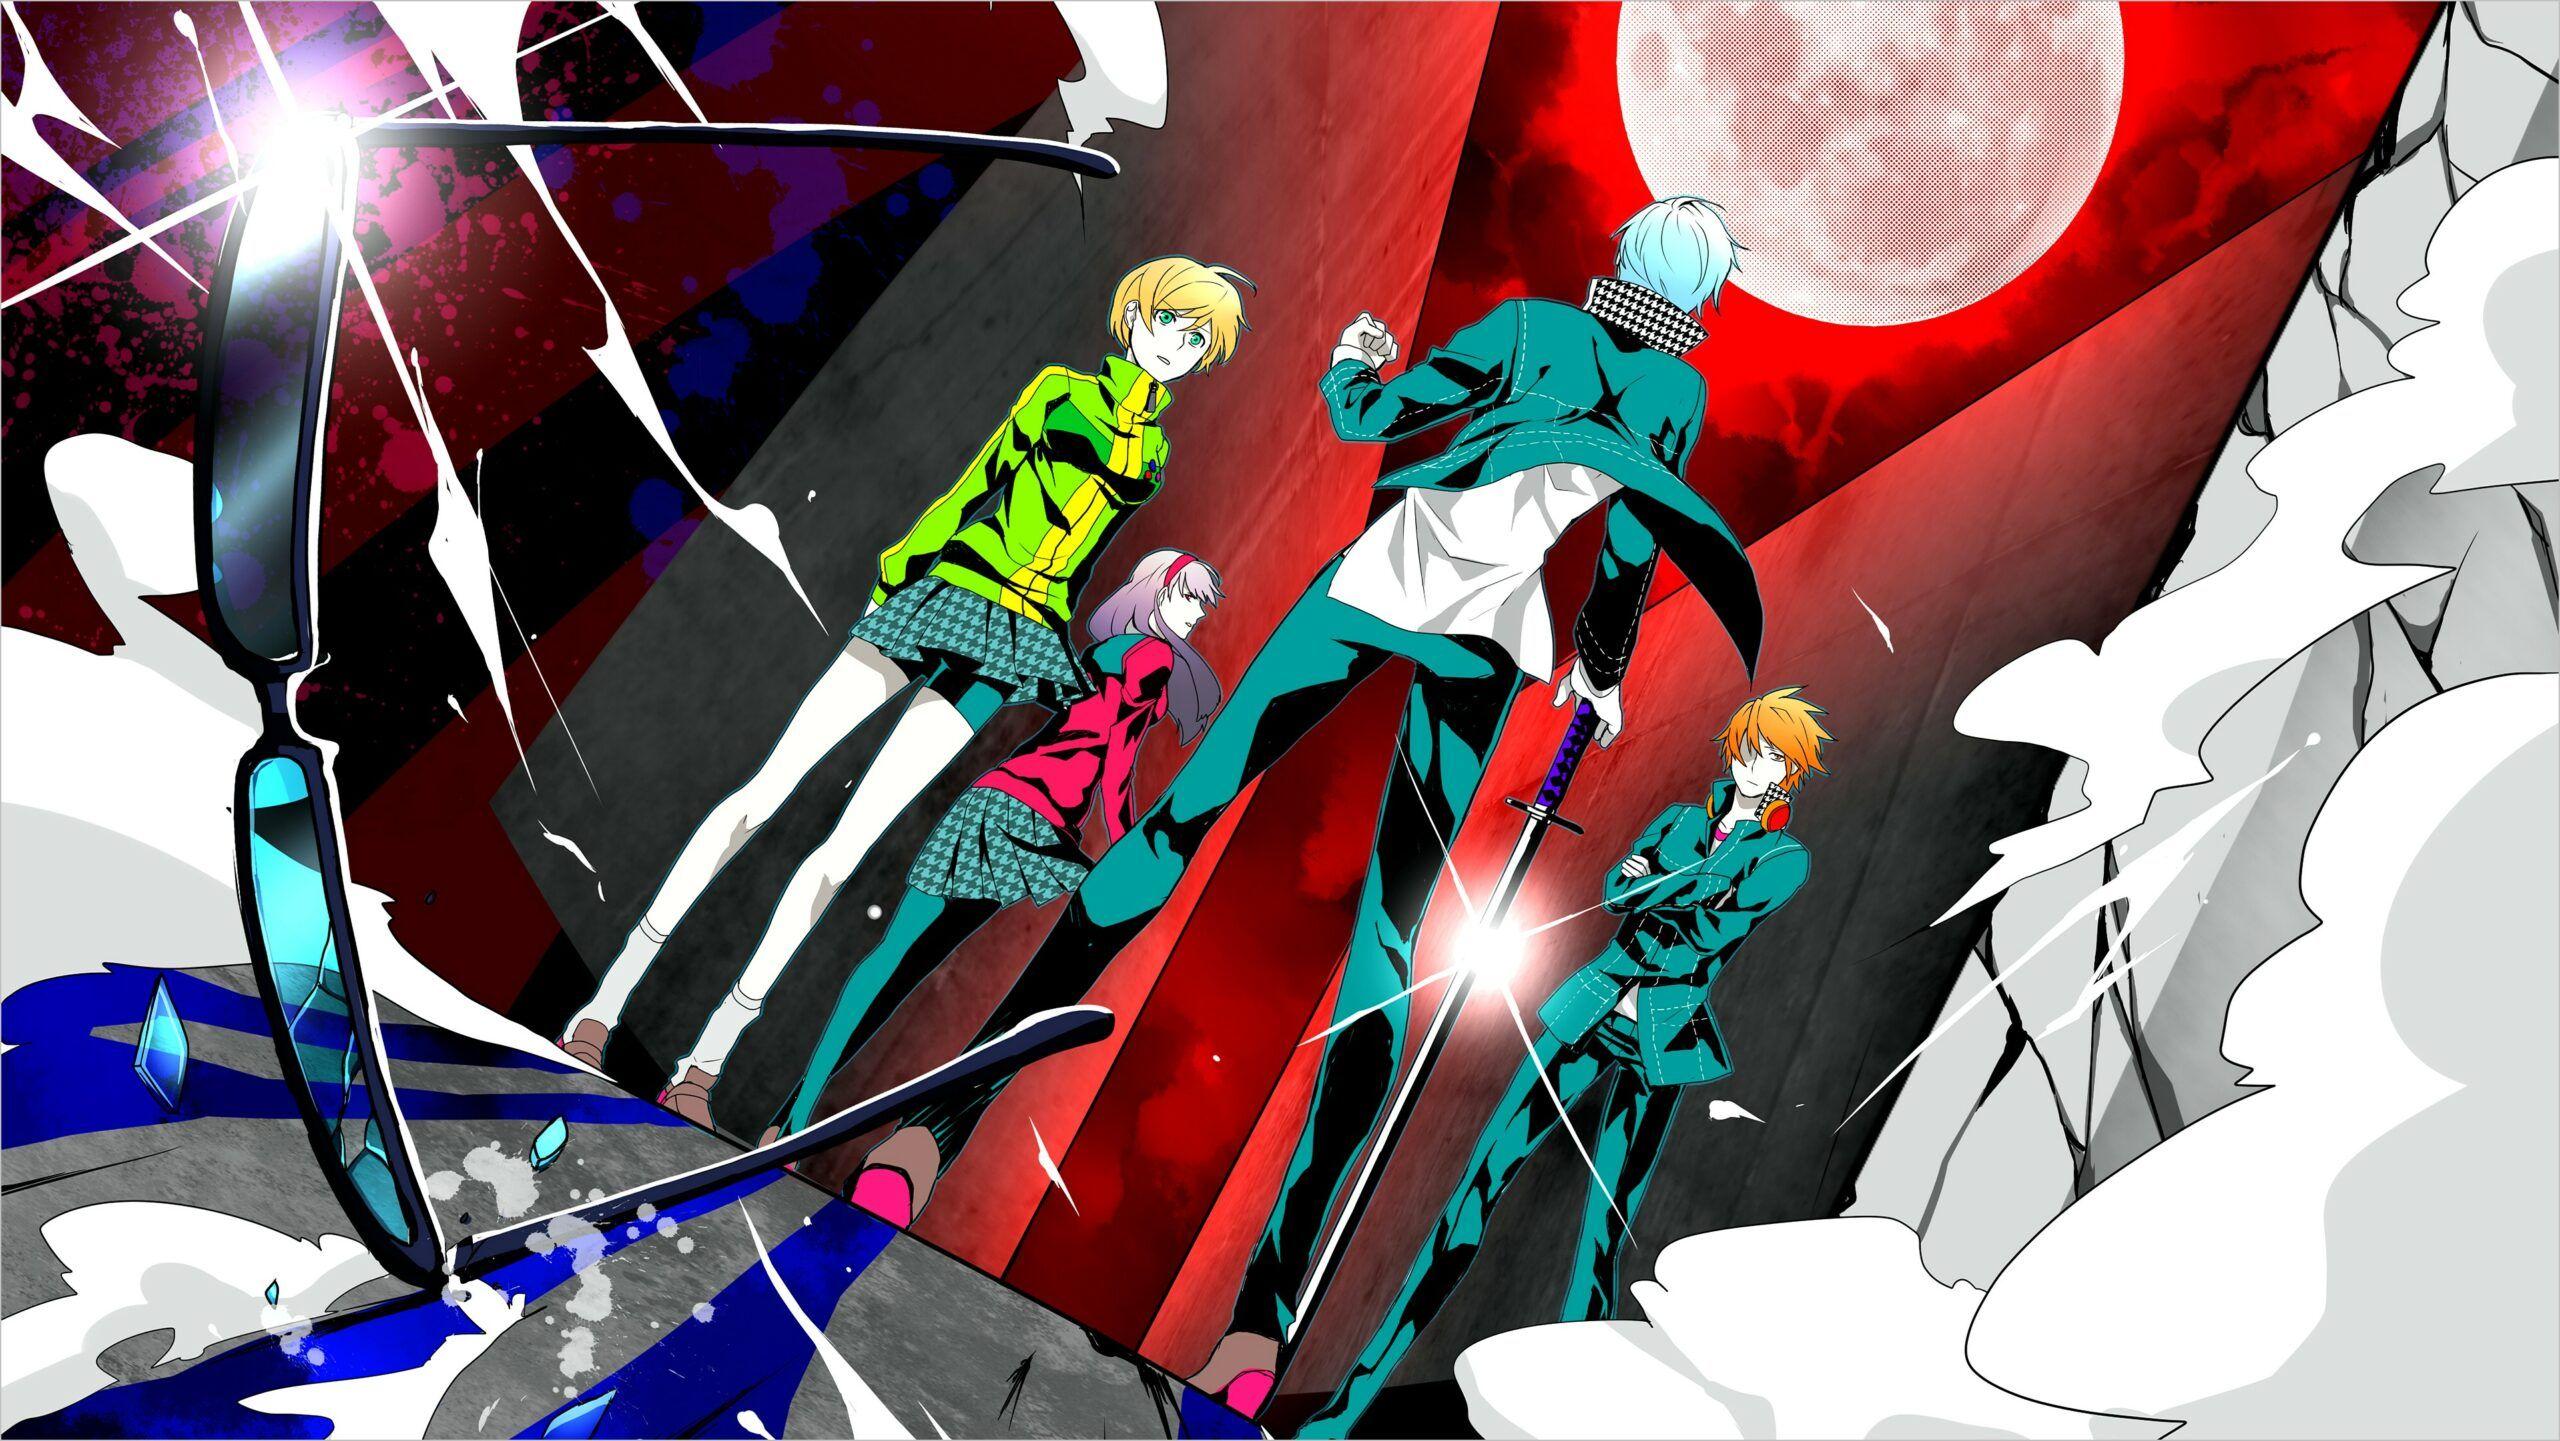 Persona 4 Wallpaper 4k Persona 4 Wallpaper Persona 4 Wallpaper